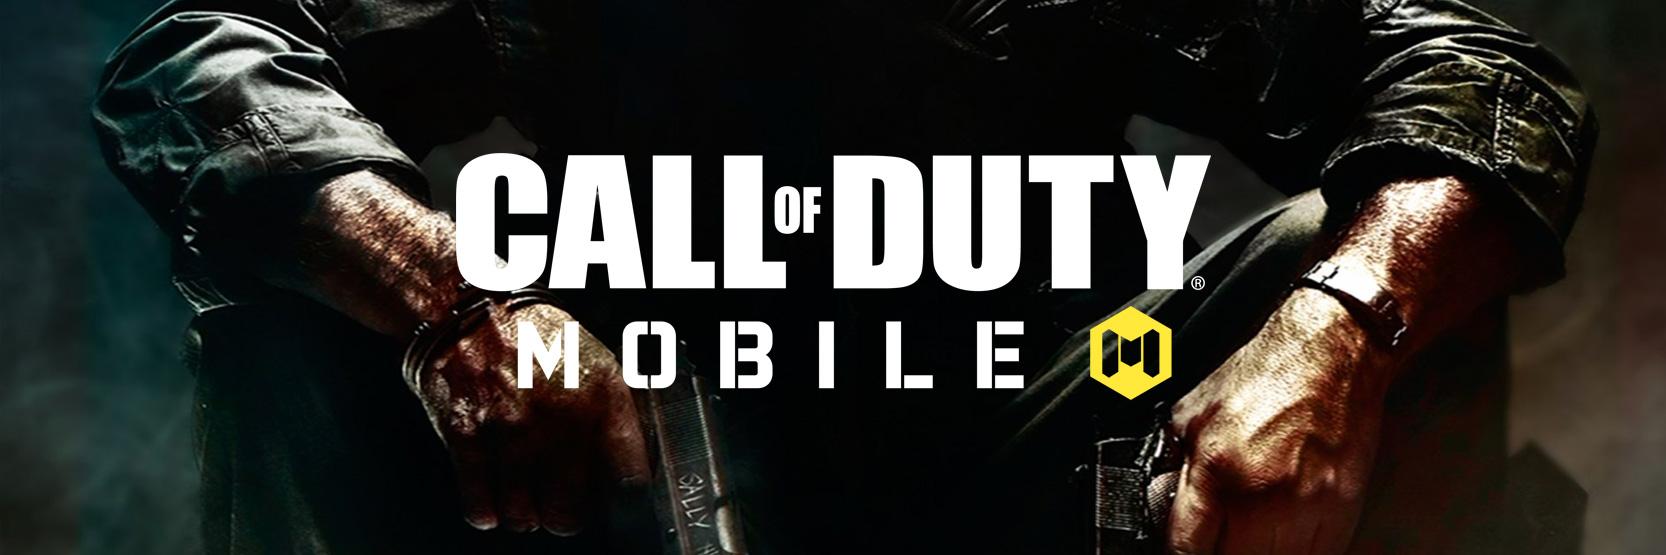 تحميل لعبة كول اوف ديوتي للجوال Call of Duty: Mobile